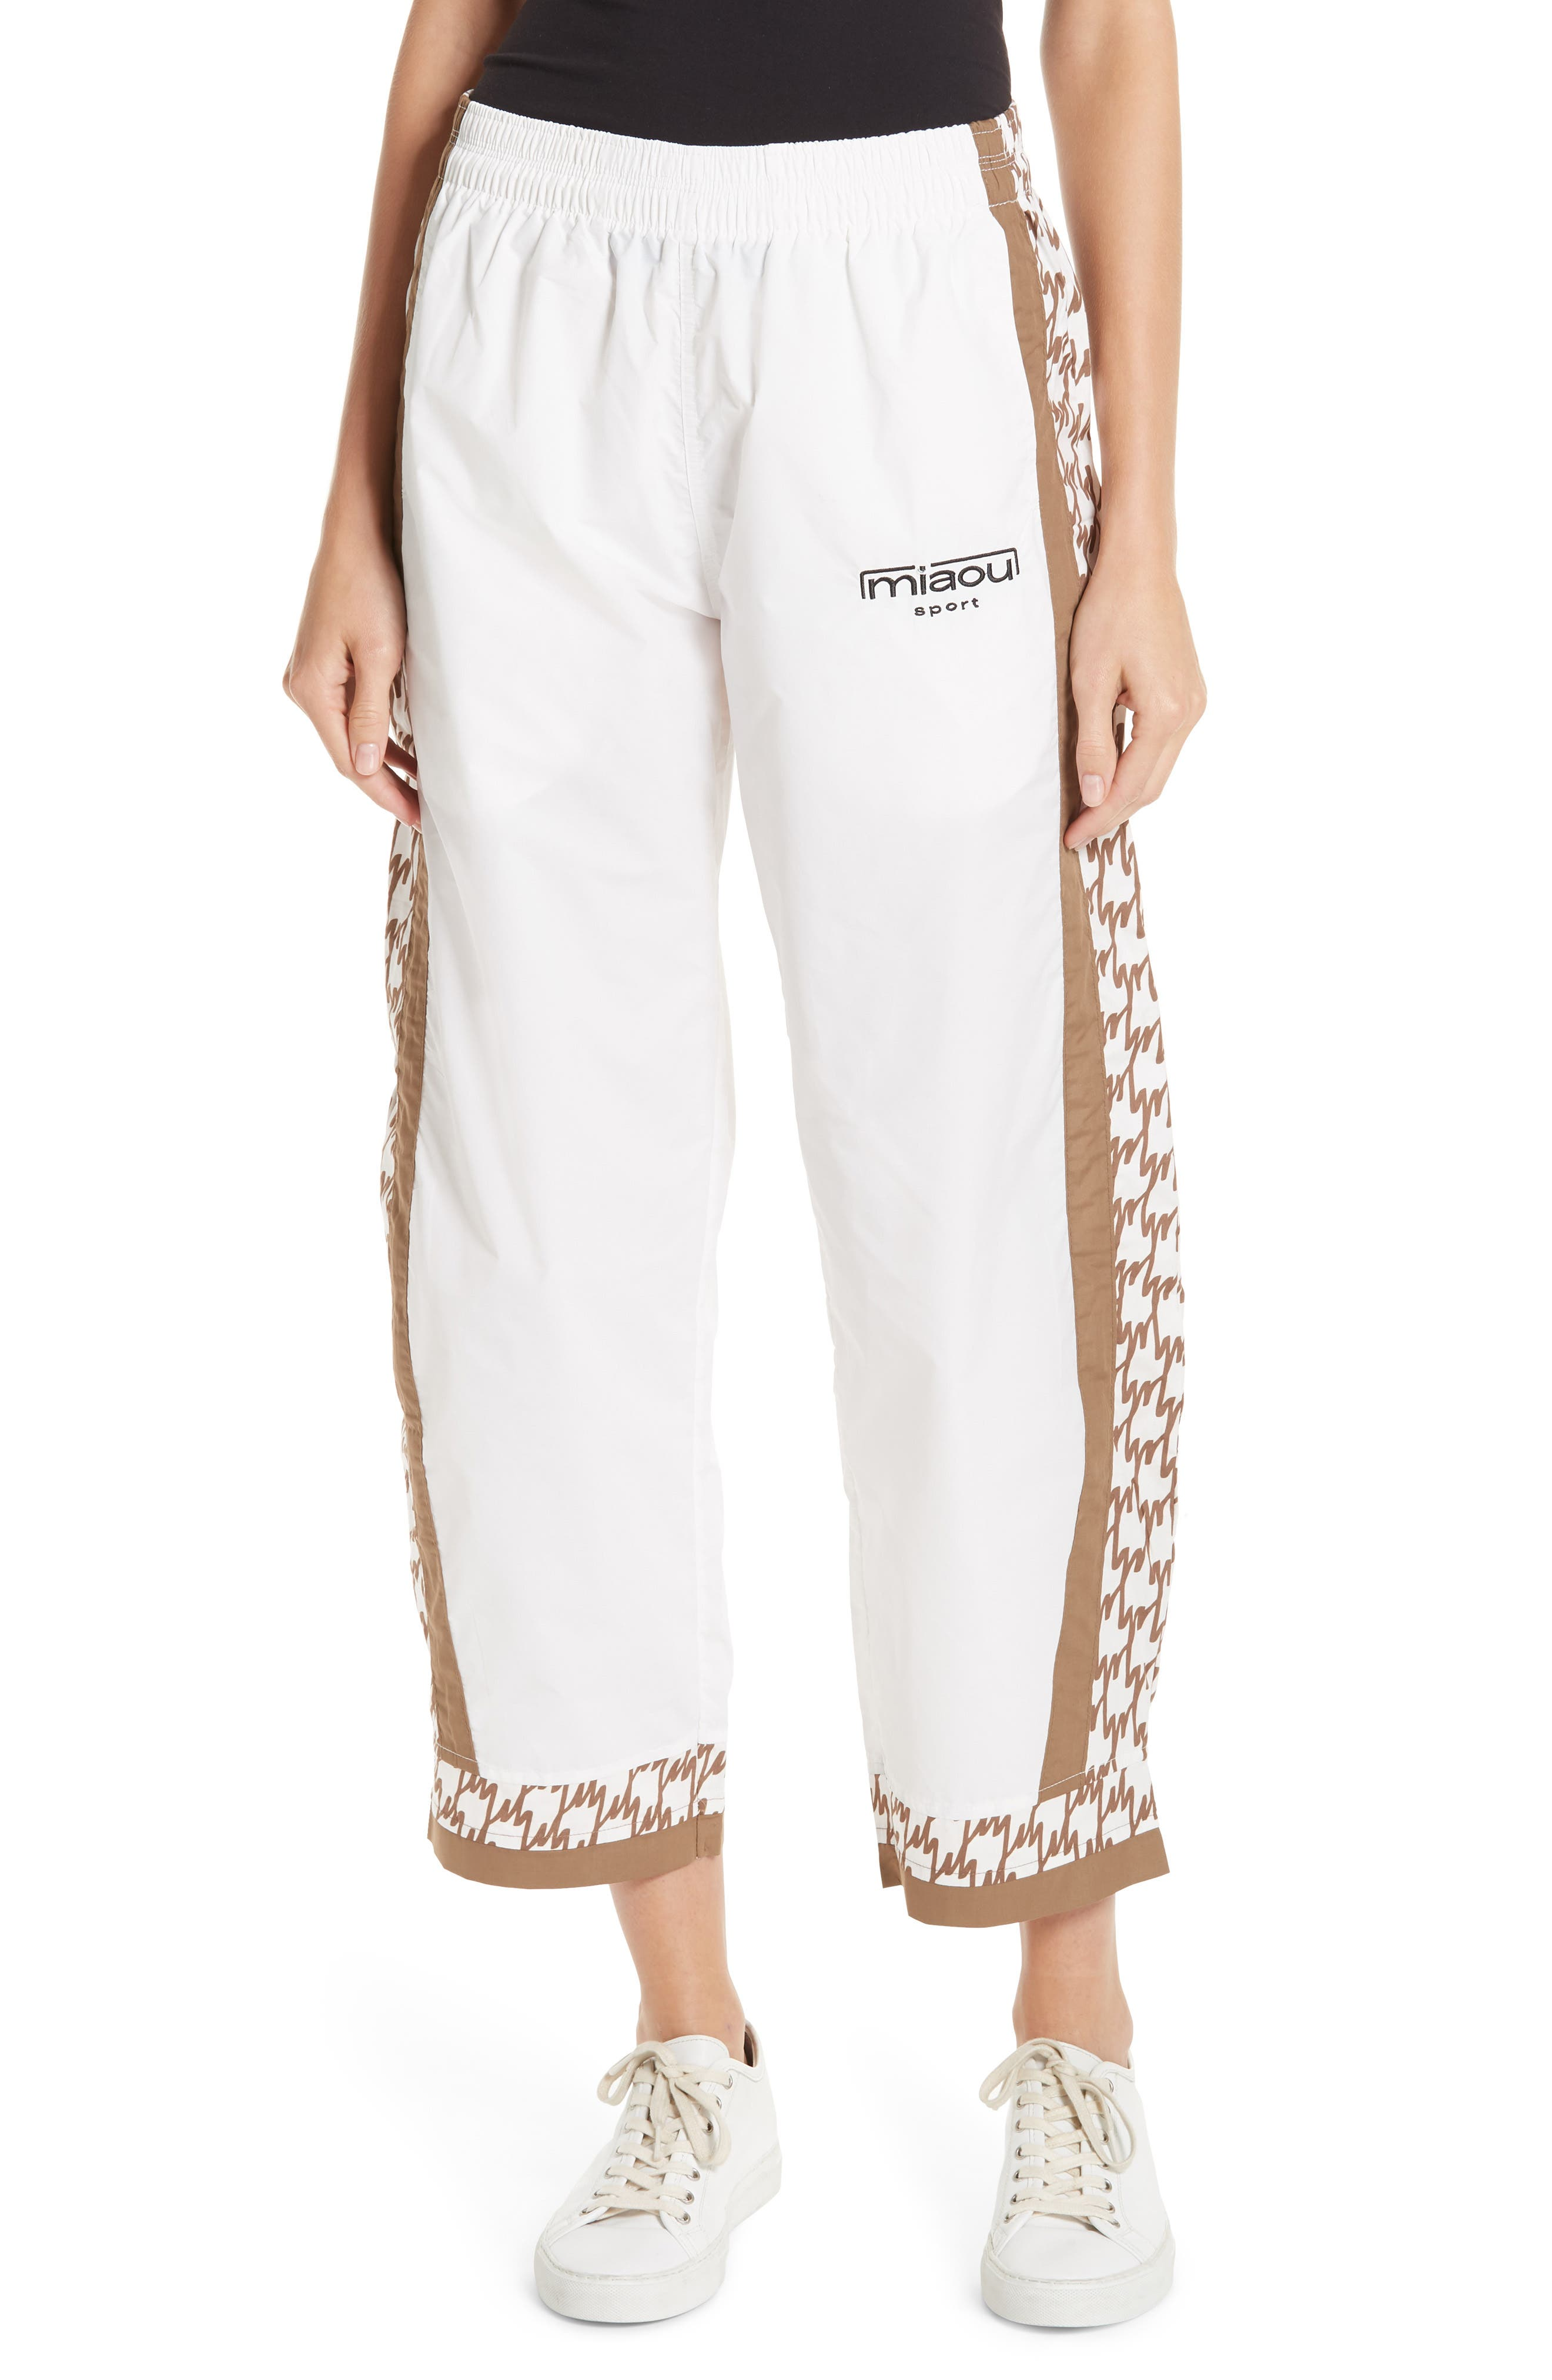 Max Track Pants,                         Main,                         color, 100